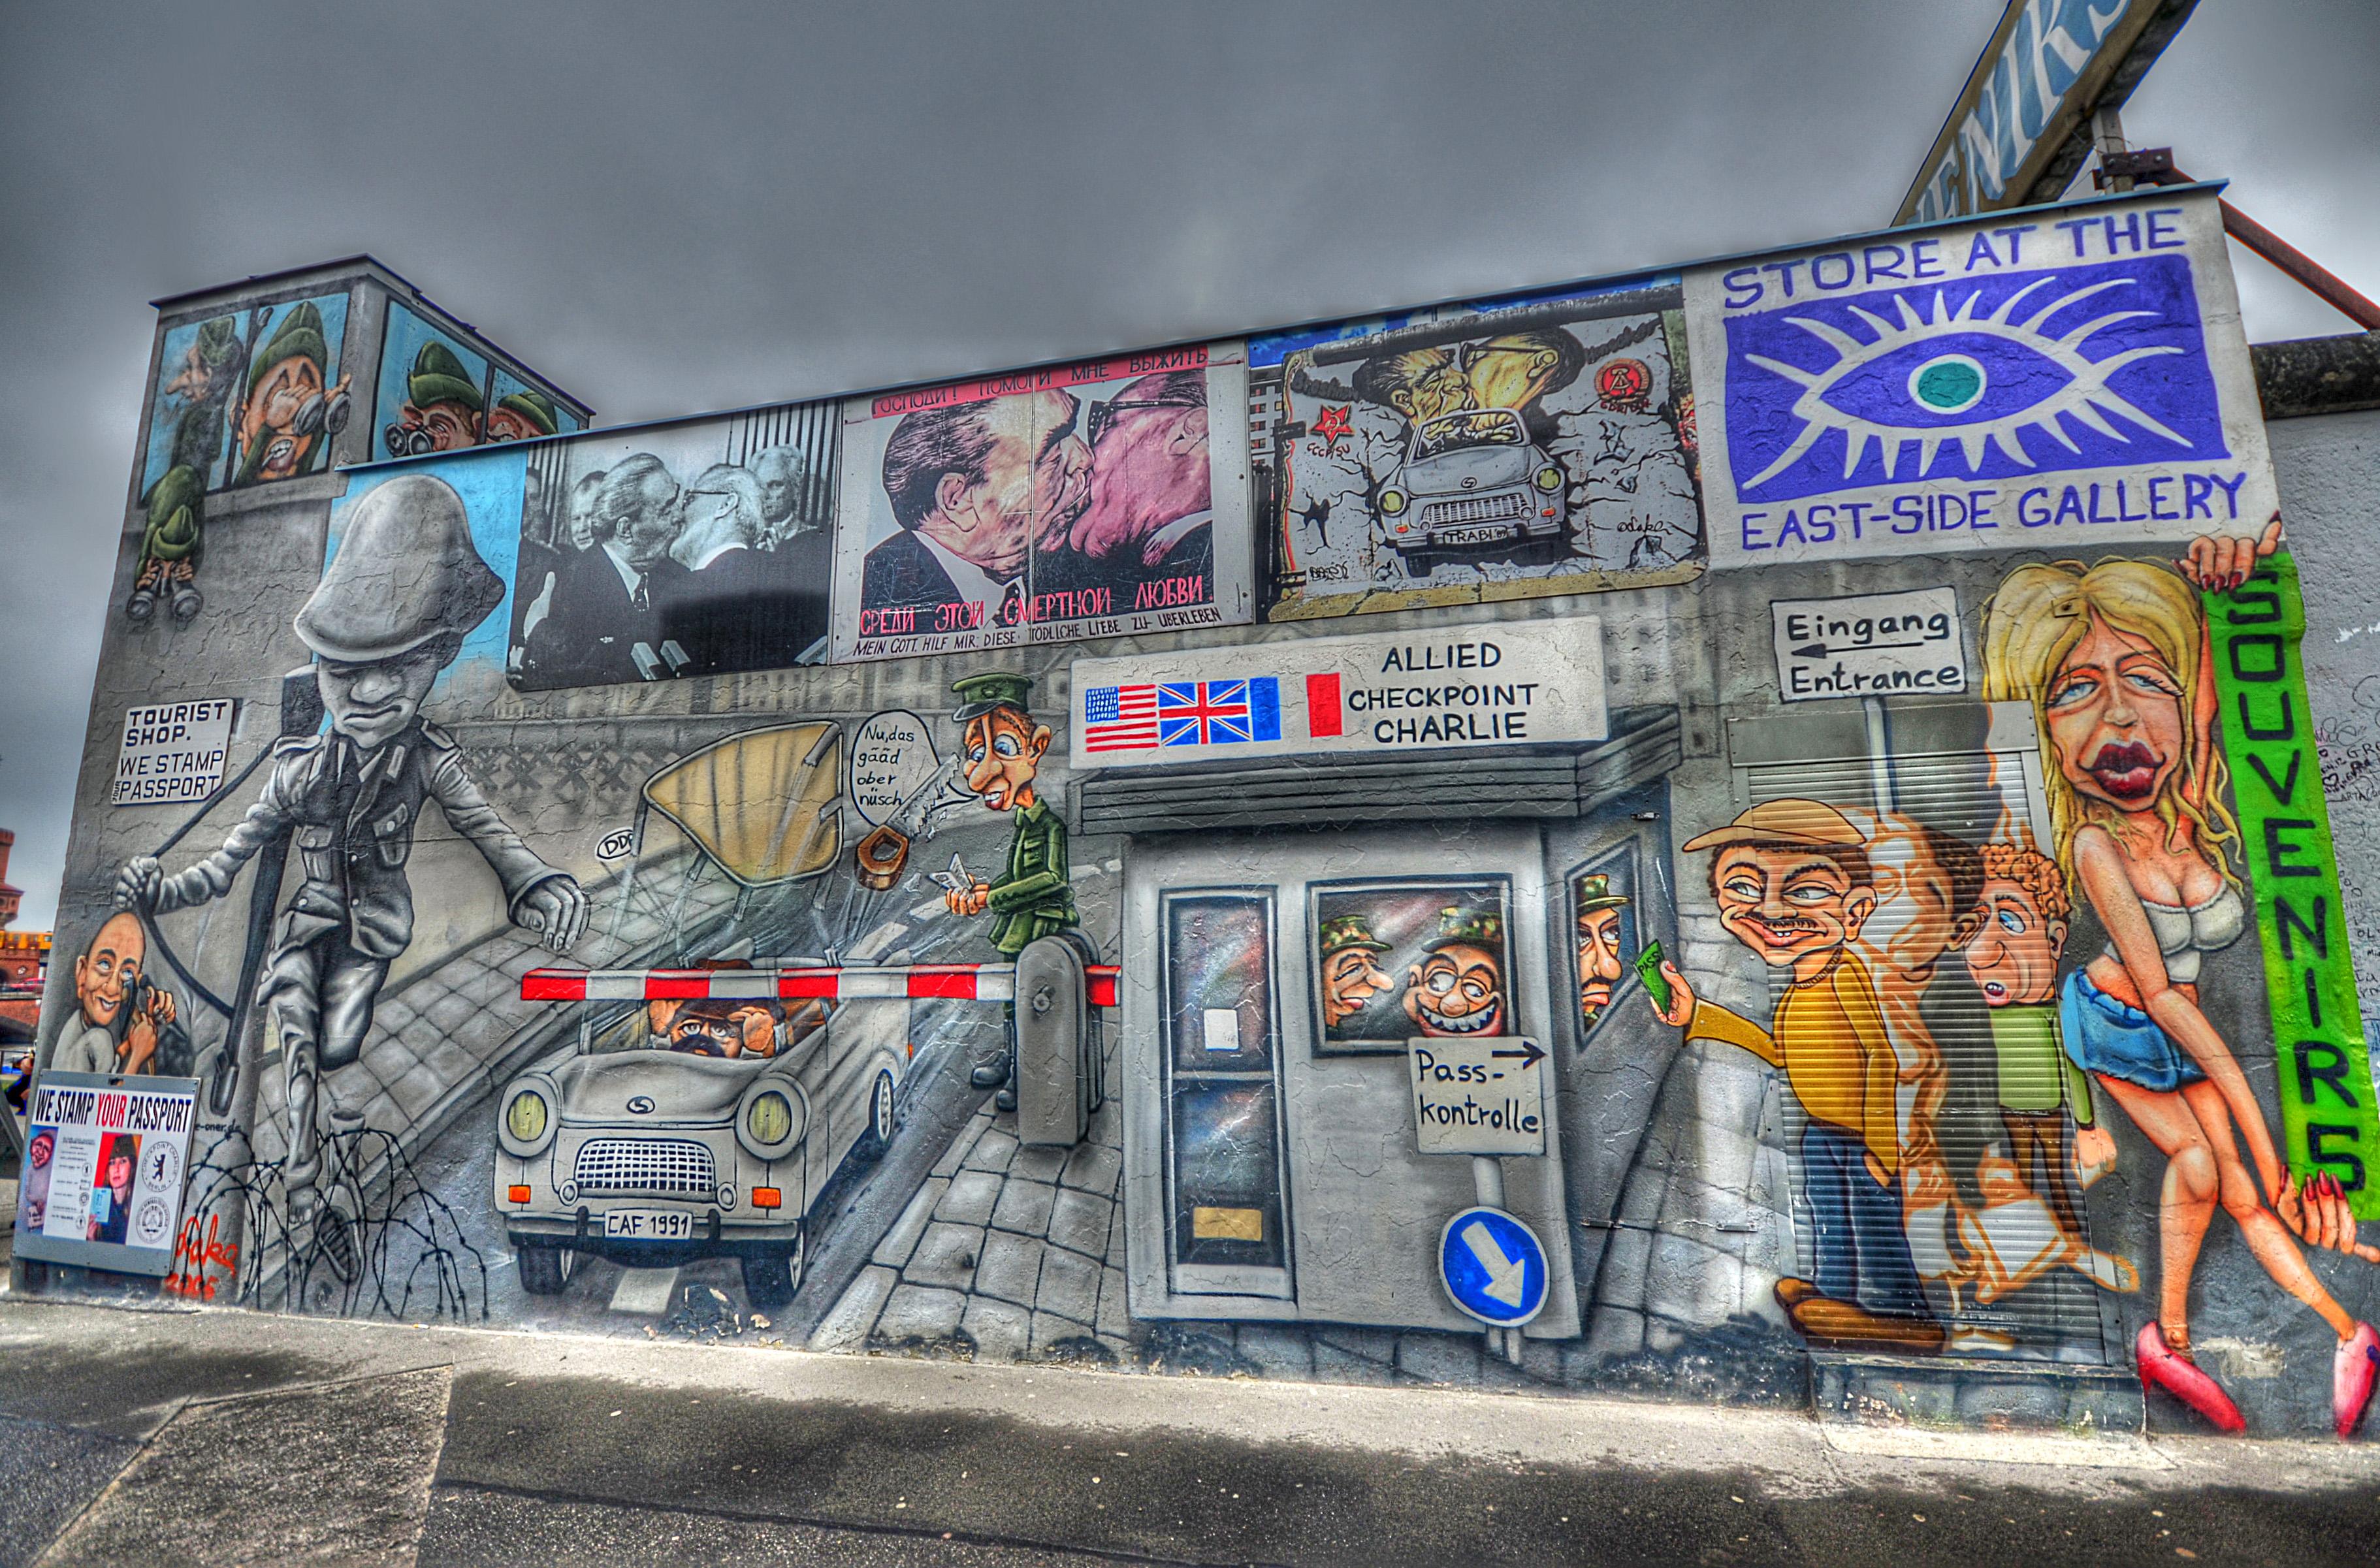 Free Images : road, wall, advertising, nikon, graffiti